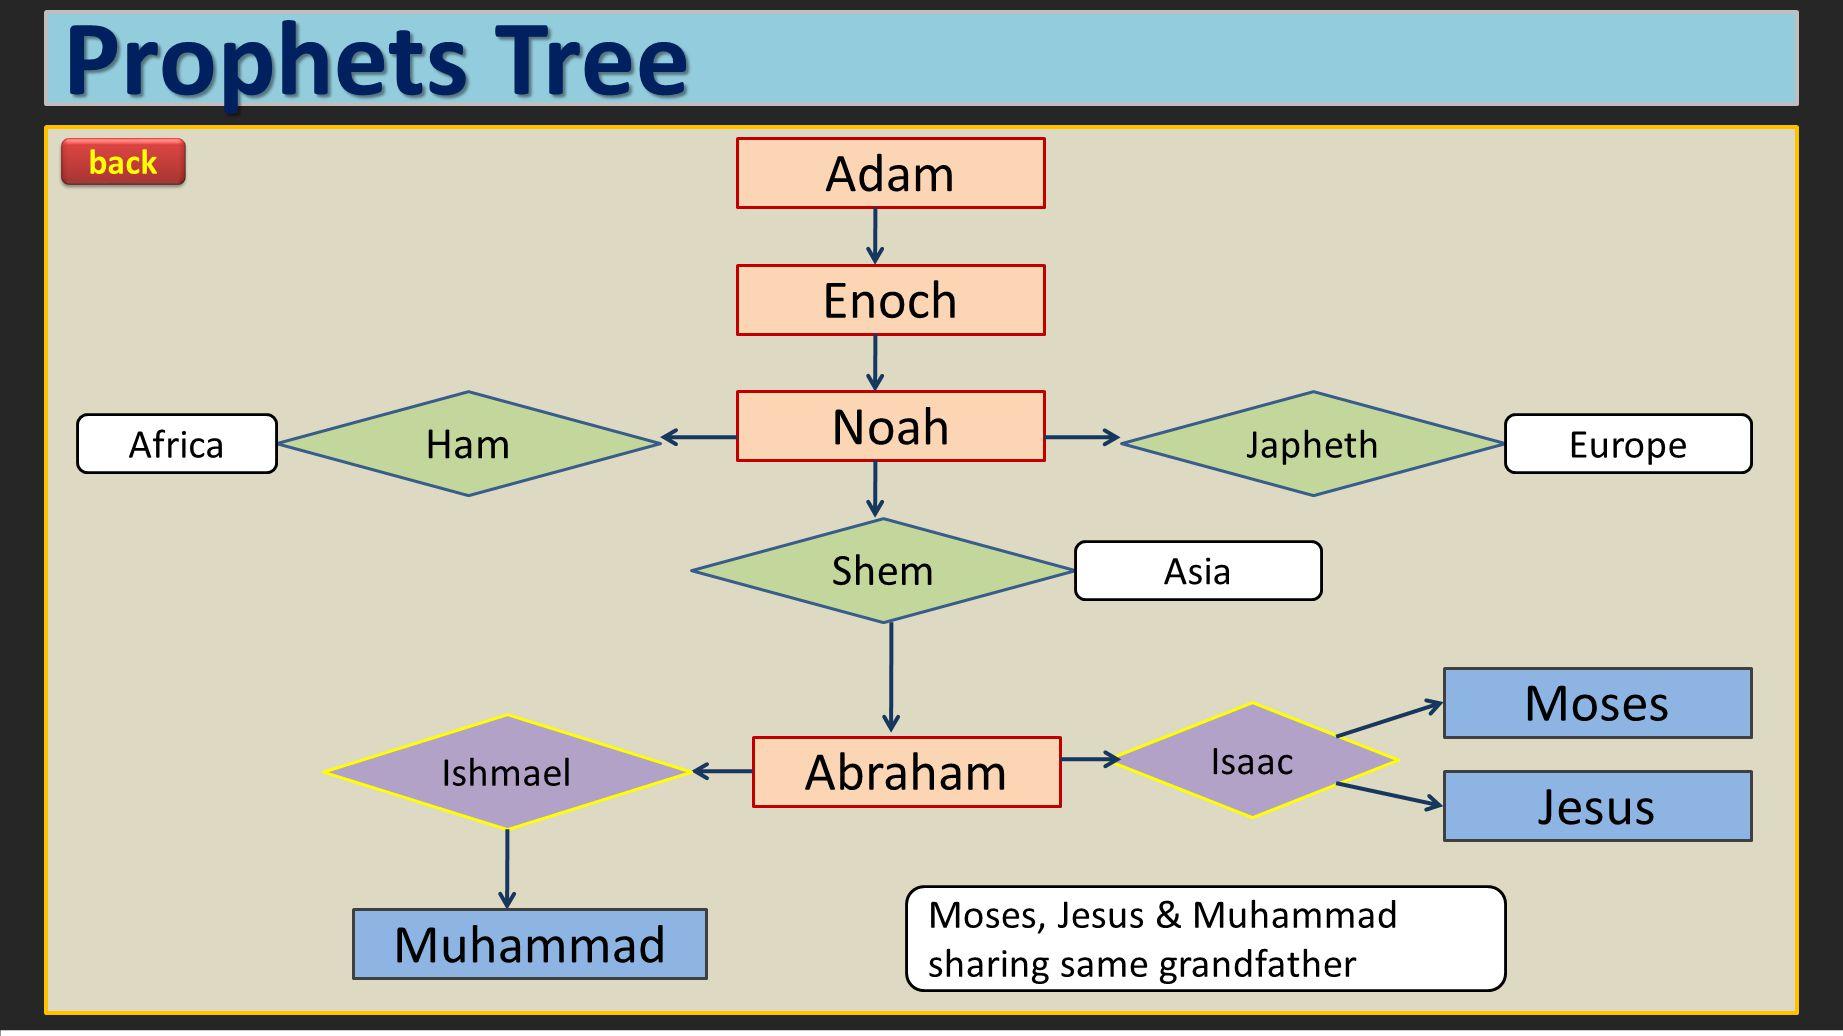 Prophets Tree Adam Muhammad Jesus Moses Abraham Noah Enoch Japheth Isaac Ishmael Shem Ham Africa Asia Europe Moses, Jesus & Muhammad sharing same grandfather back